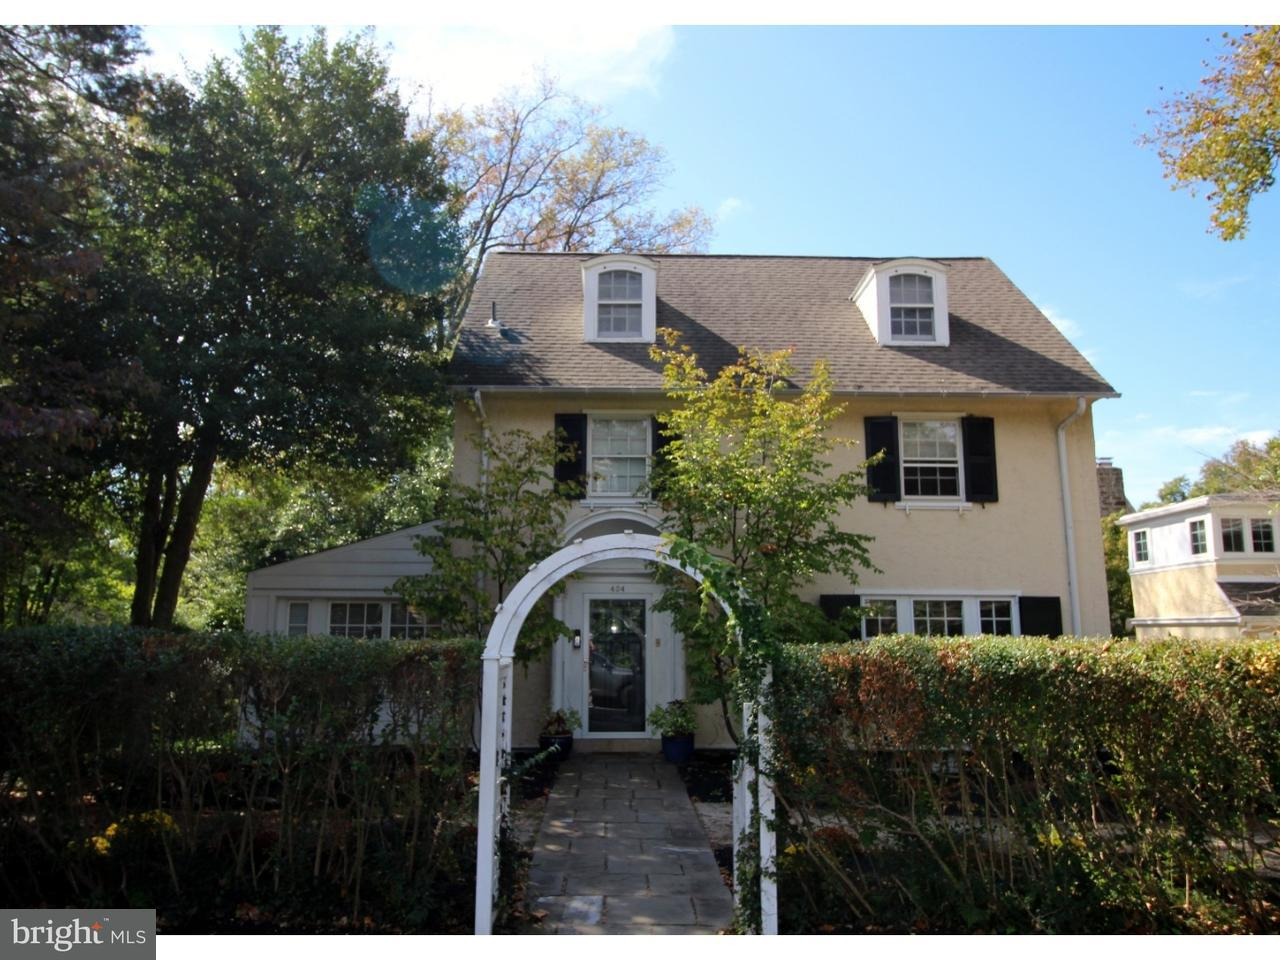 424  Berkley Haverford, PA 19041